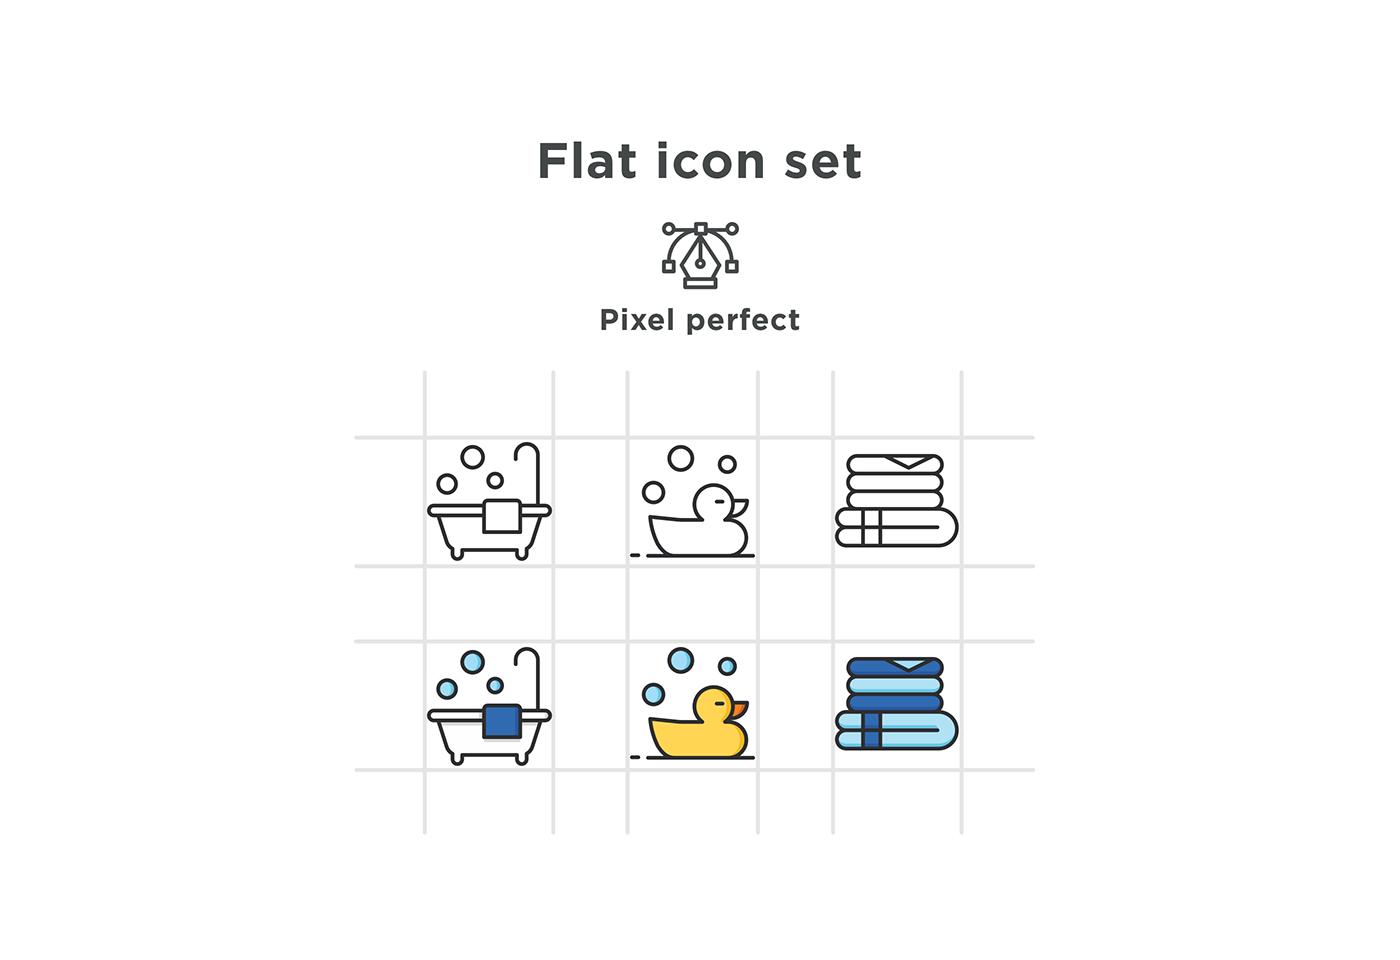 free icons icons free download flat bathroom icons bathroom toothbrush Sink towel